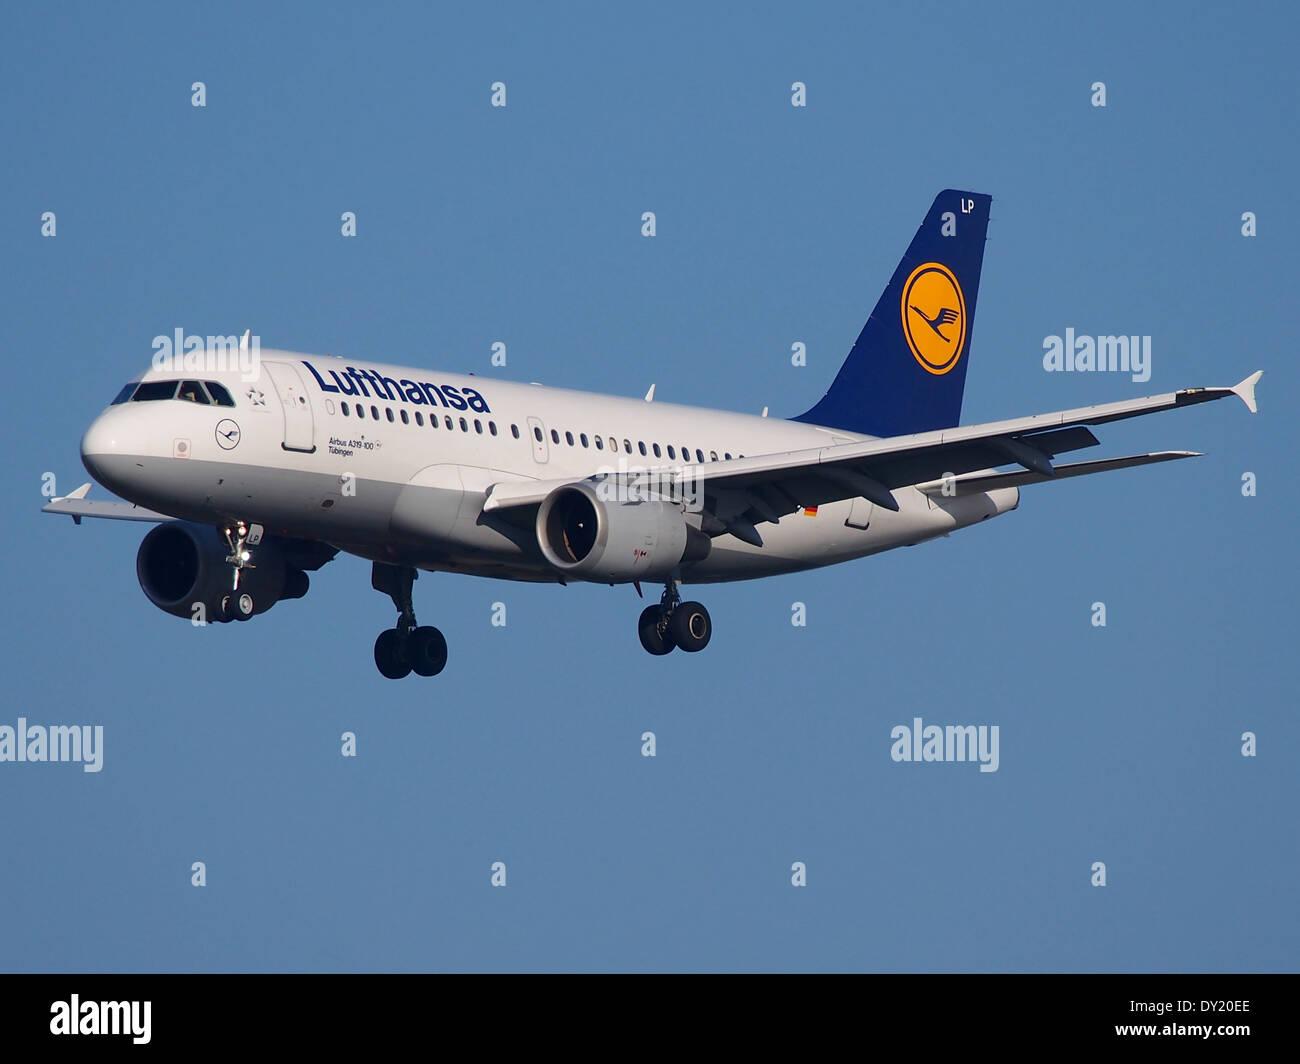 D-AILP Lufthansa Airbus A319-114, landing at Schiphol (AMS - EHAM), Netherlands, pic2 - Stock Image